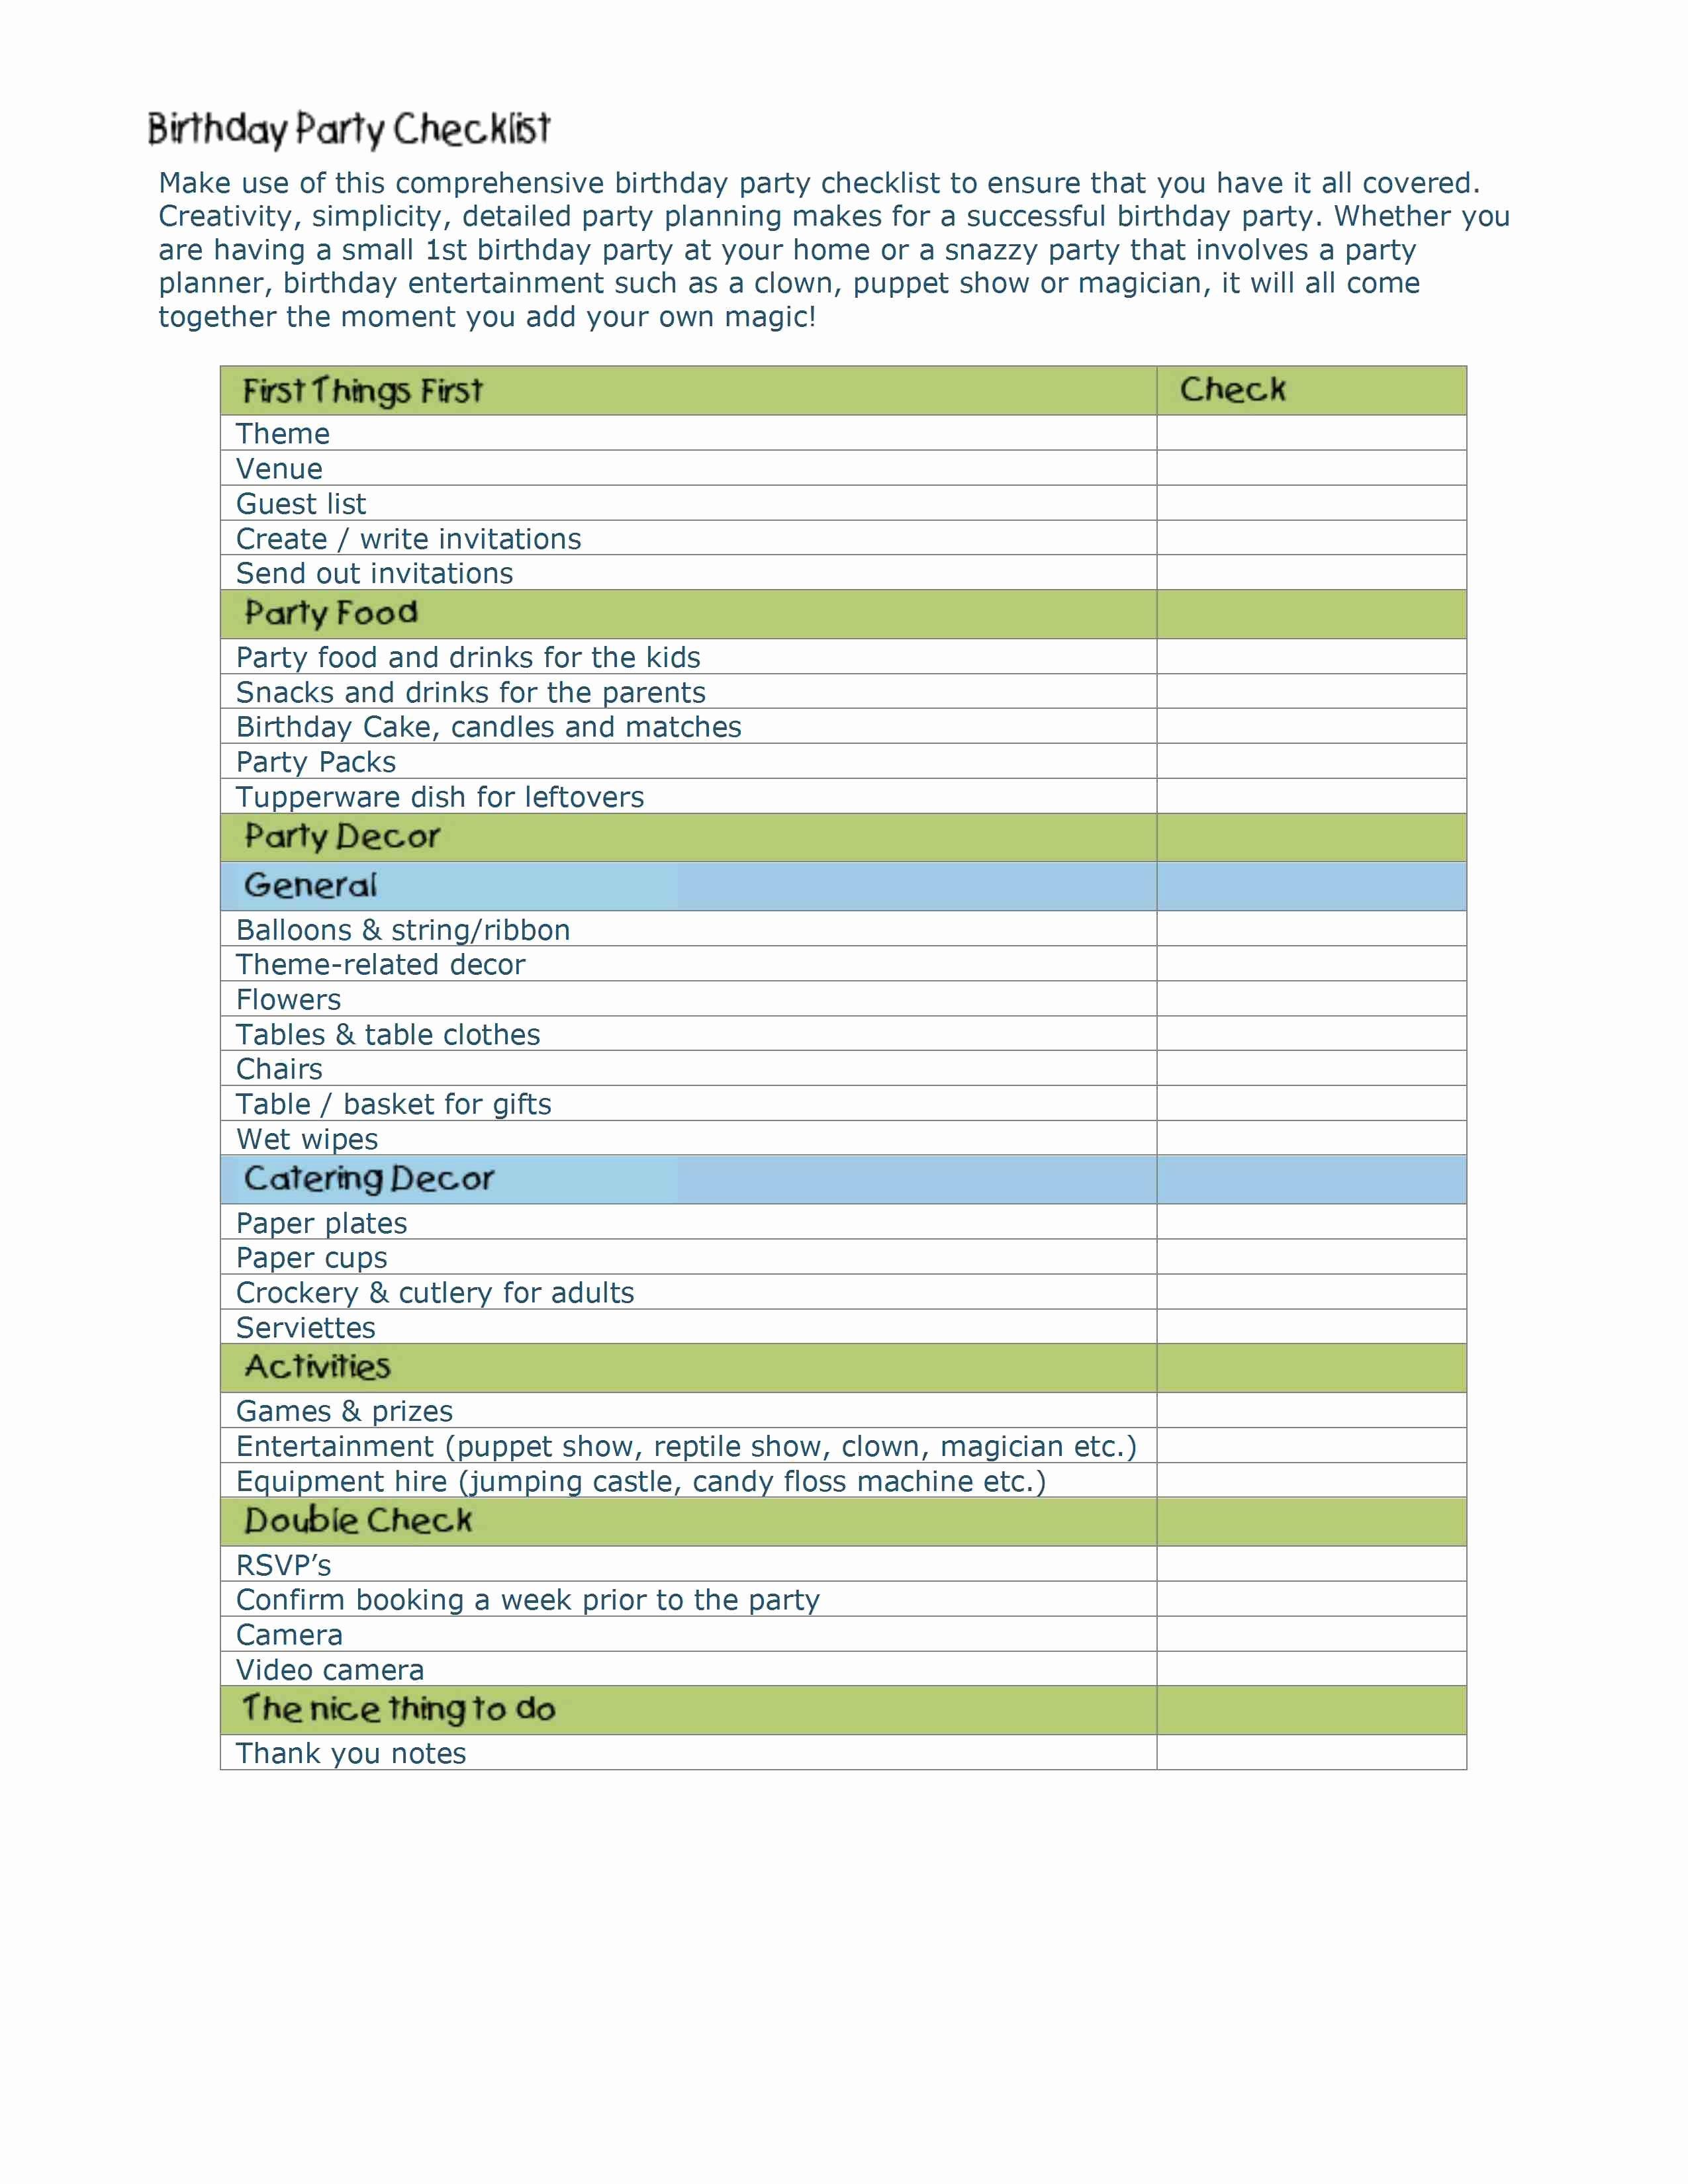 Party Plan Checklist Template Unique event Planning Checklist Template